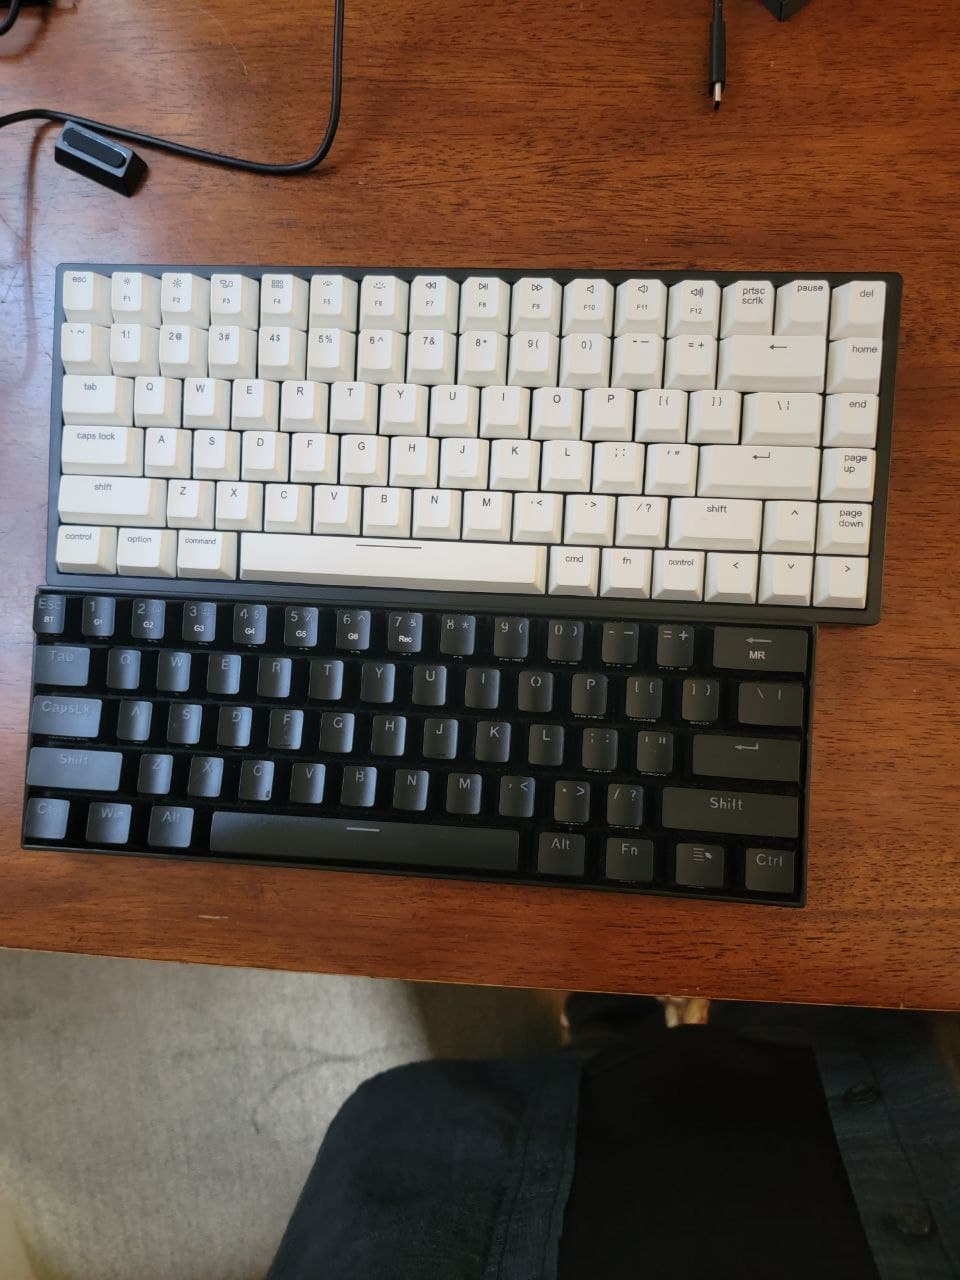 Vissles V84 vs my 60% Redragon keyboard